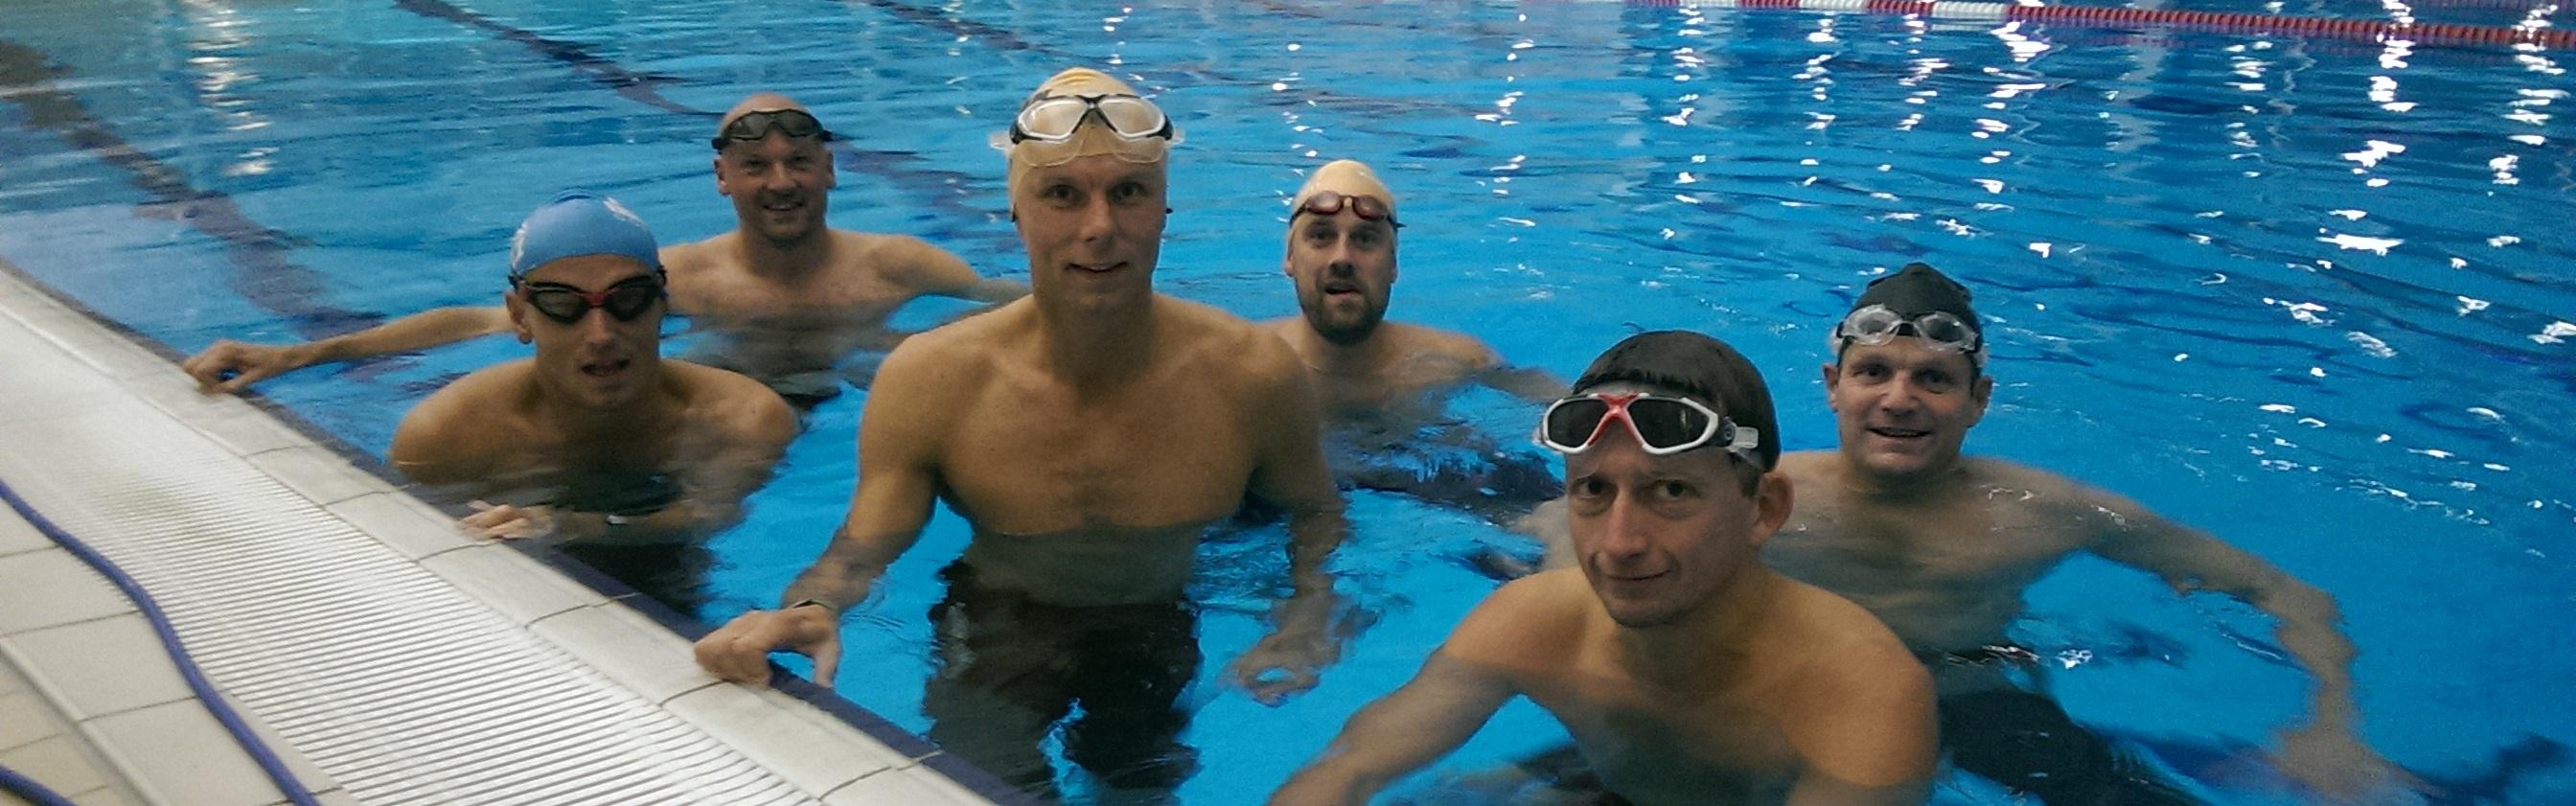 svømning træning